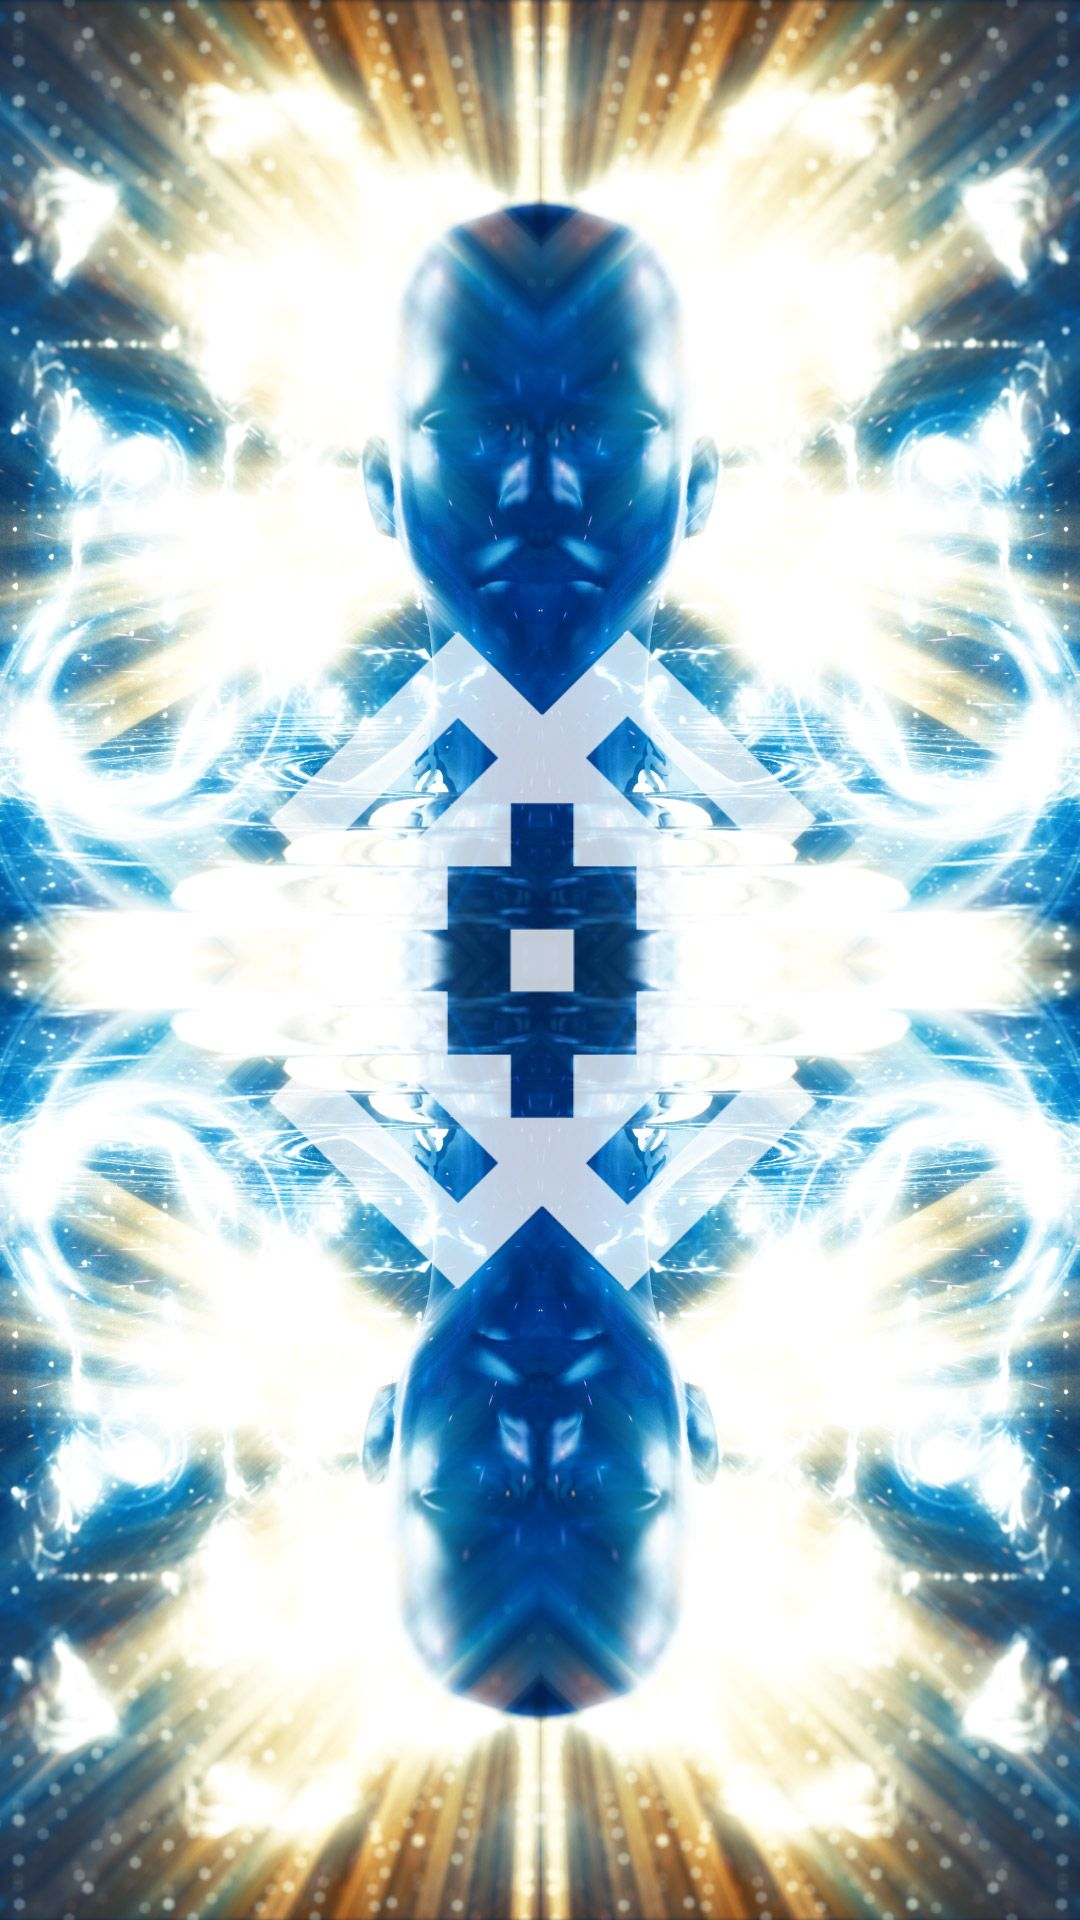 3d Wallpapery Bufo Alvarius The Underground Secret Psychedelic Art Art Psychedelic